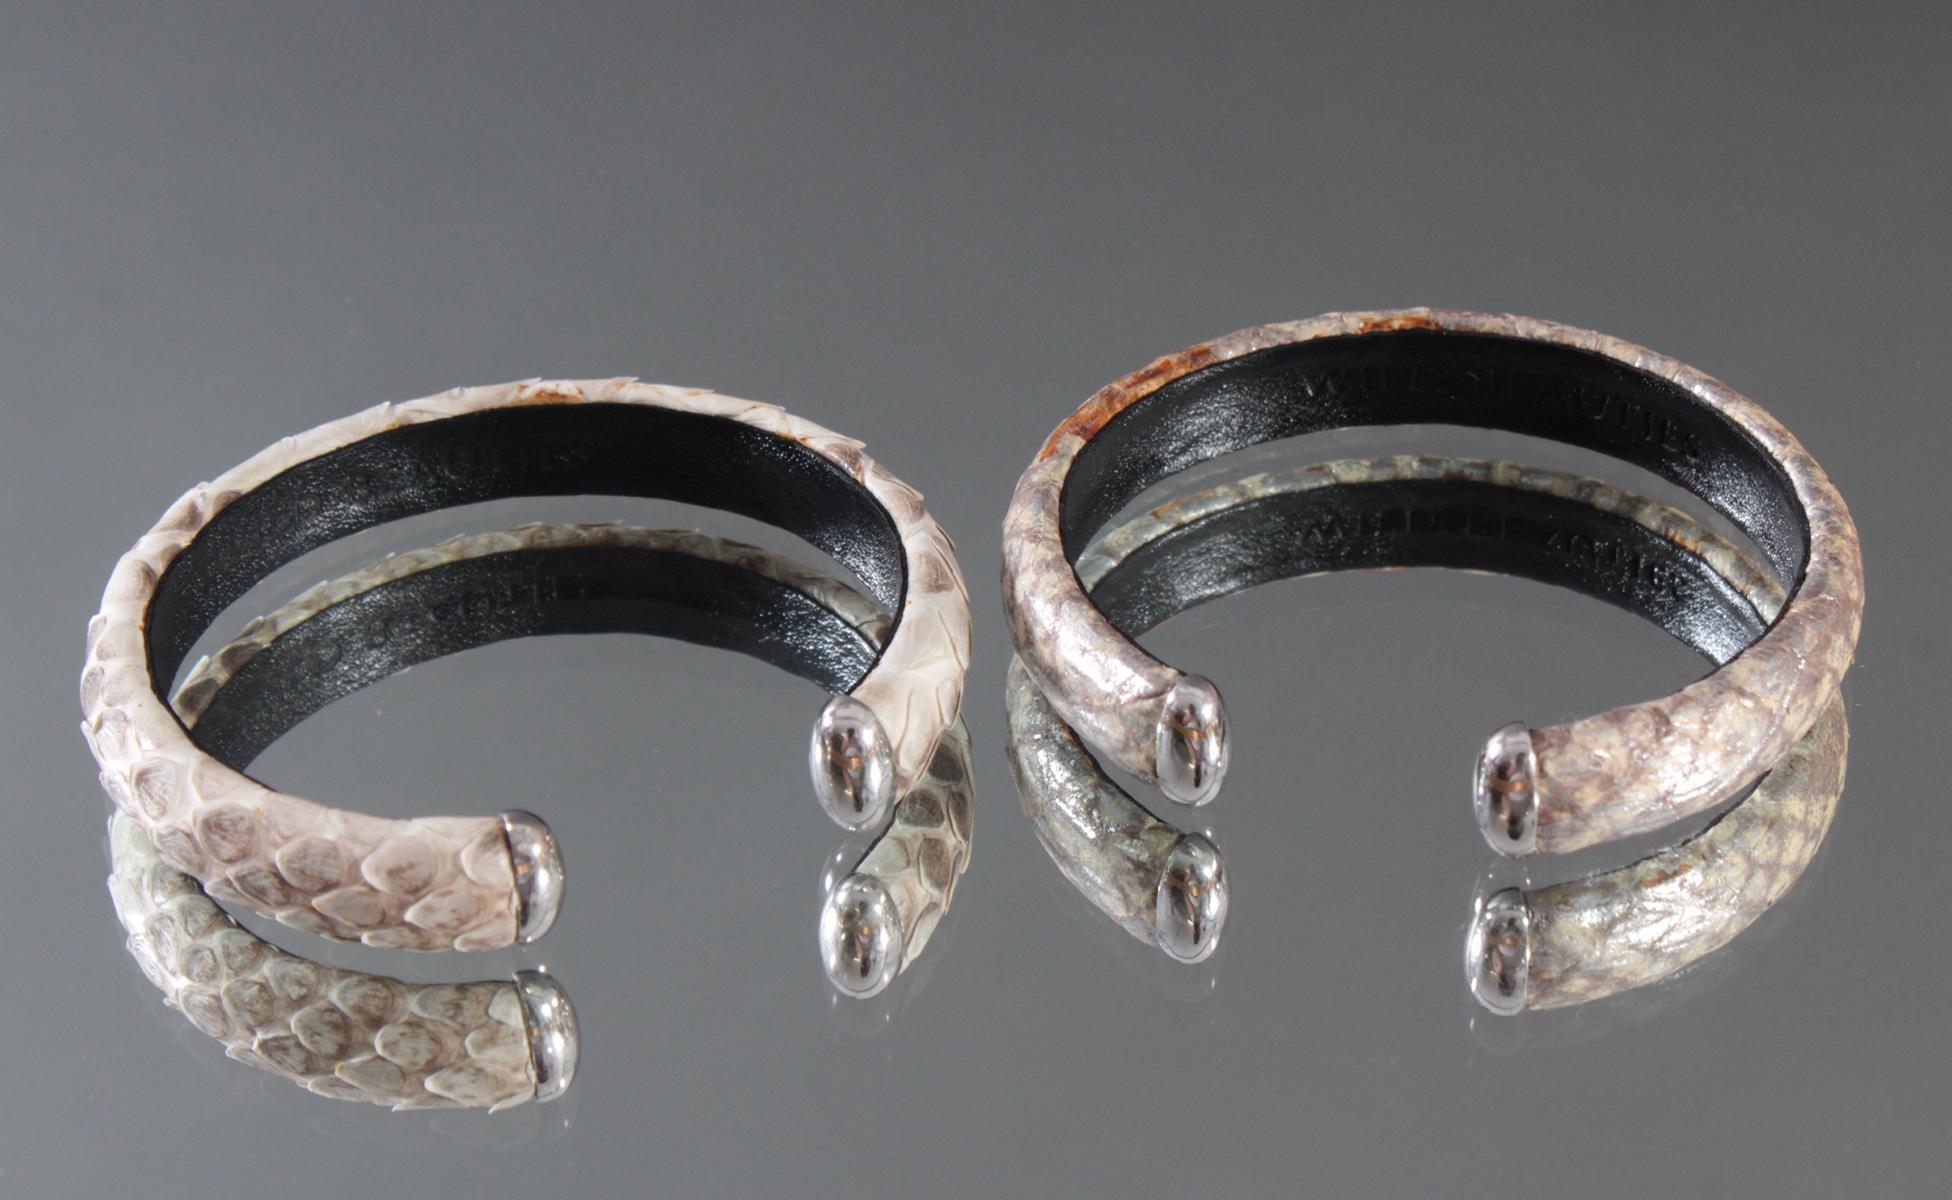 2 Schlangenleder-Armbänder mit Sterlingsilber-Montur-2